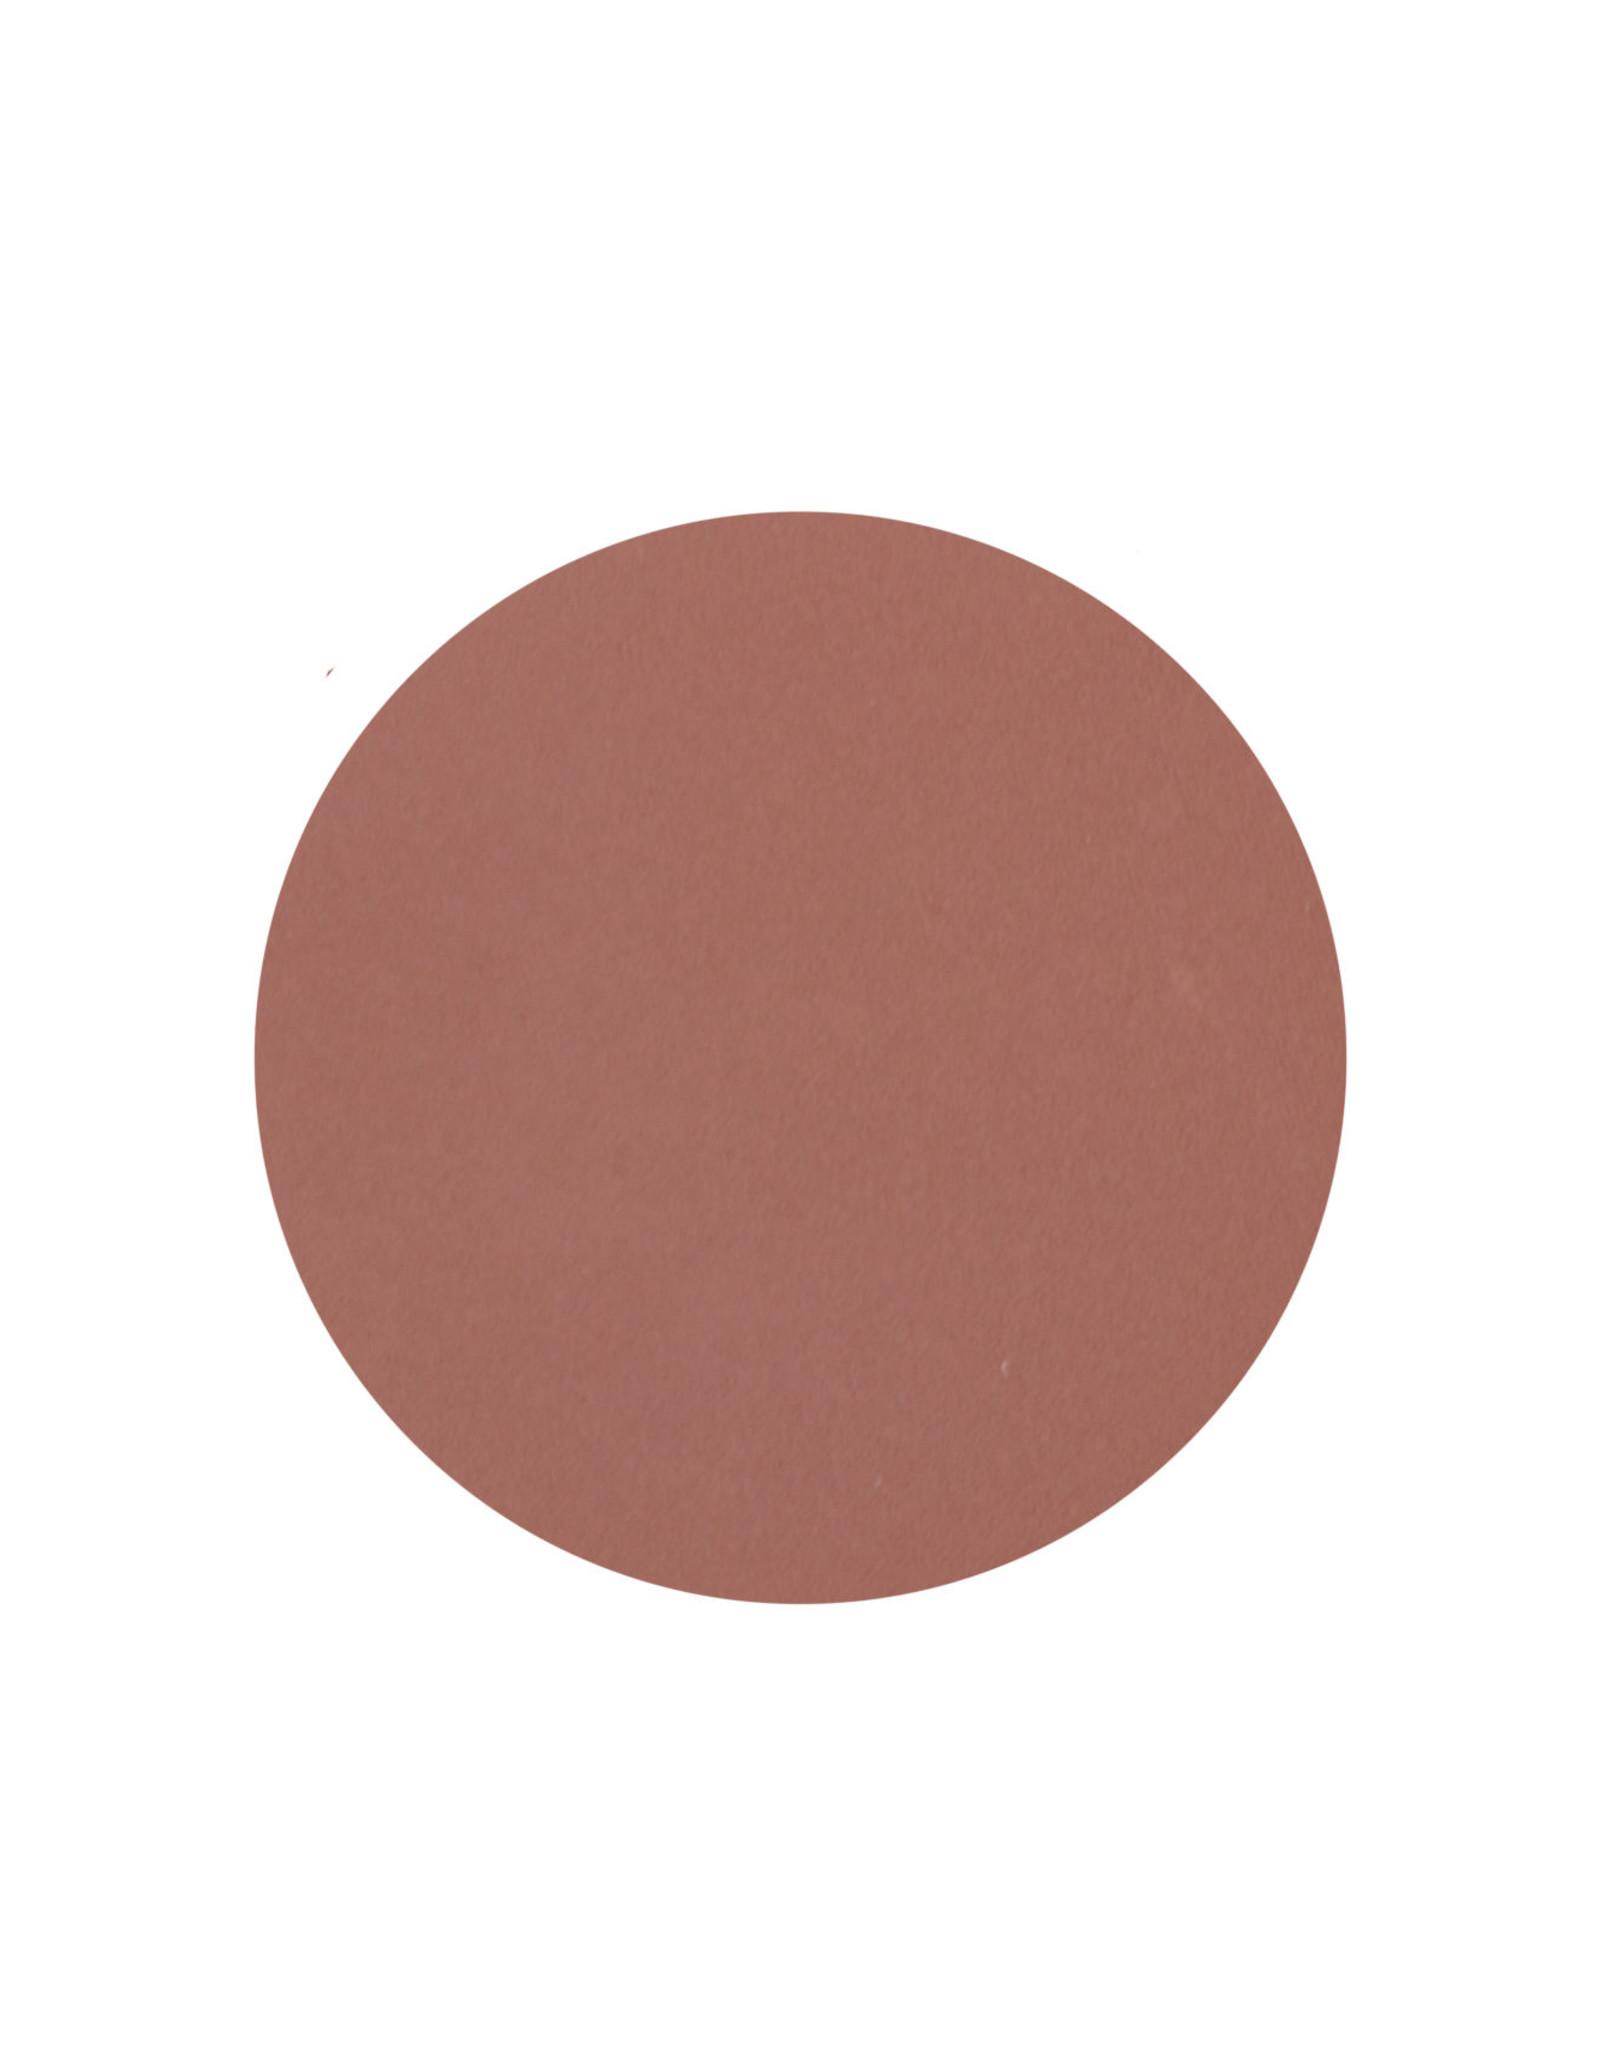 CentpurCent Cent pur Cent - Refillable Compacte Foundation - Dark